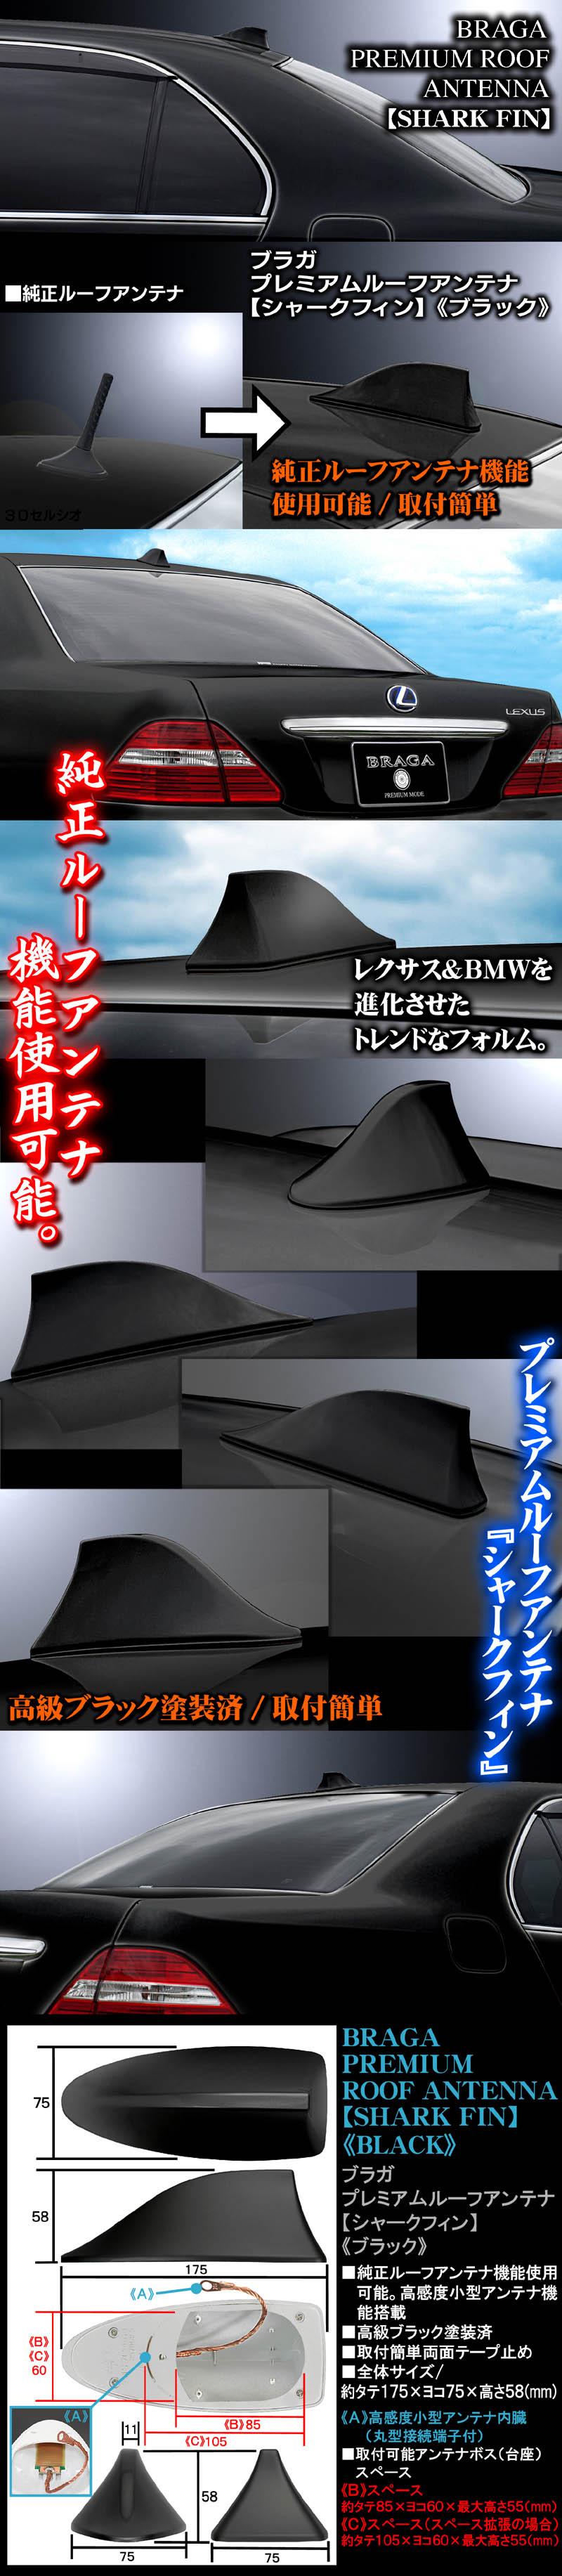 T-1【ブラック】塗装済/プレミアム シャーク フィン アンテナ/純正交換式/小型アンテナ内蔵/取説付/ルーフ,ドルフィンアンテナ/ブラガ